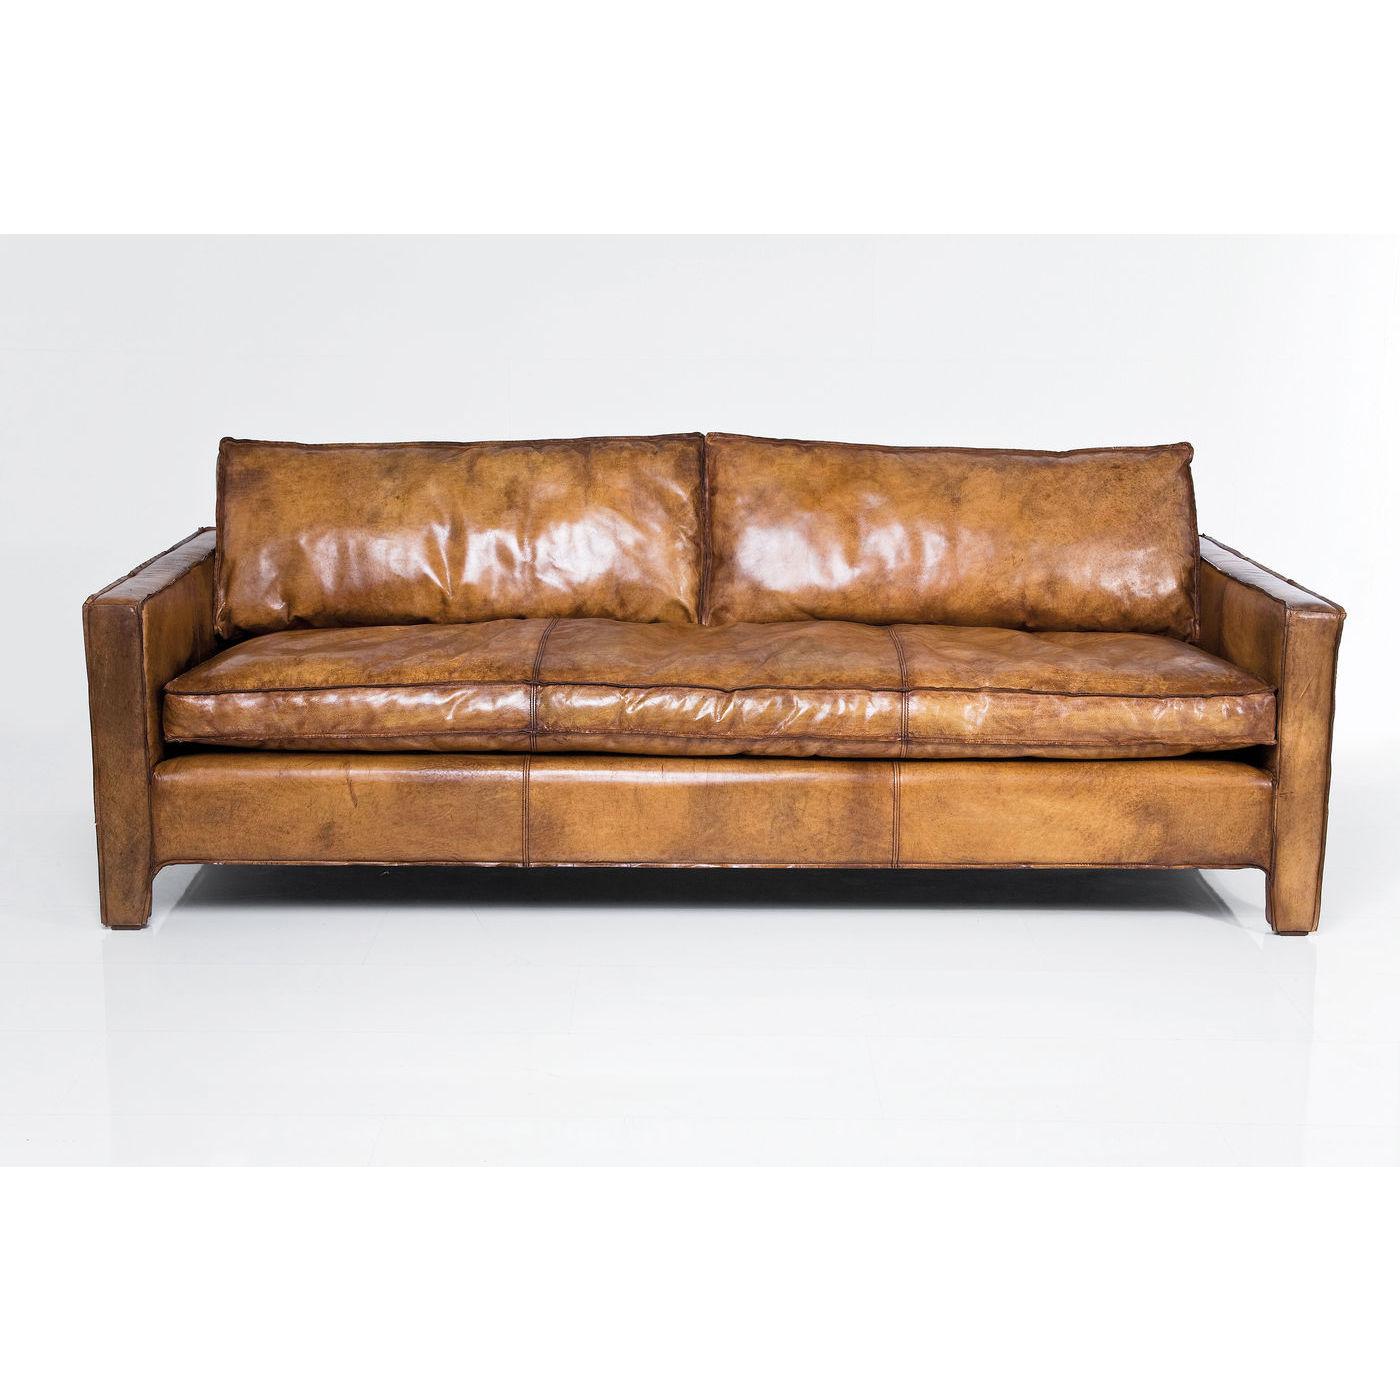 sofa couch 3 sitzer dreisitzer buffalo b ffelleder braun neu kare design ebay. Black Bedroom Furniture Sets. Home Design Ideas